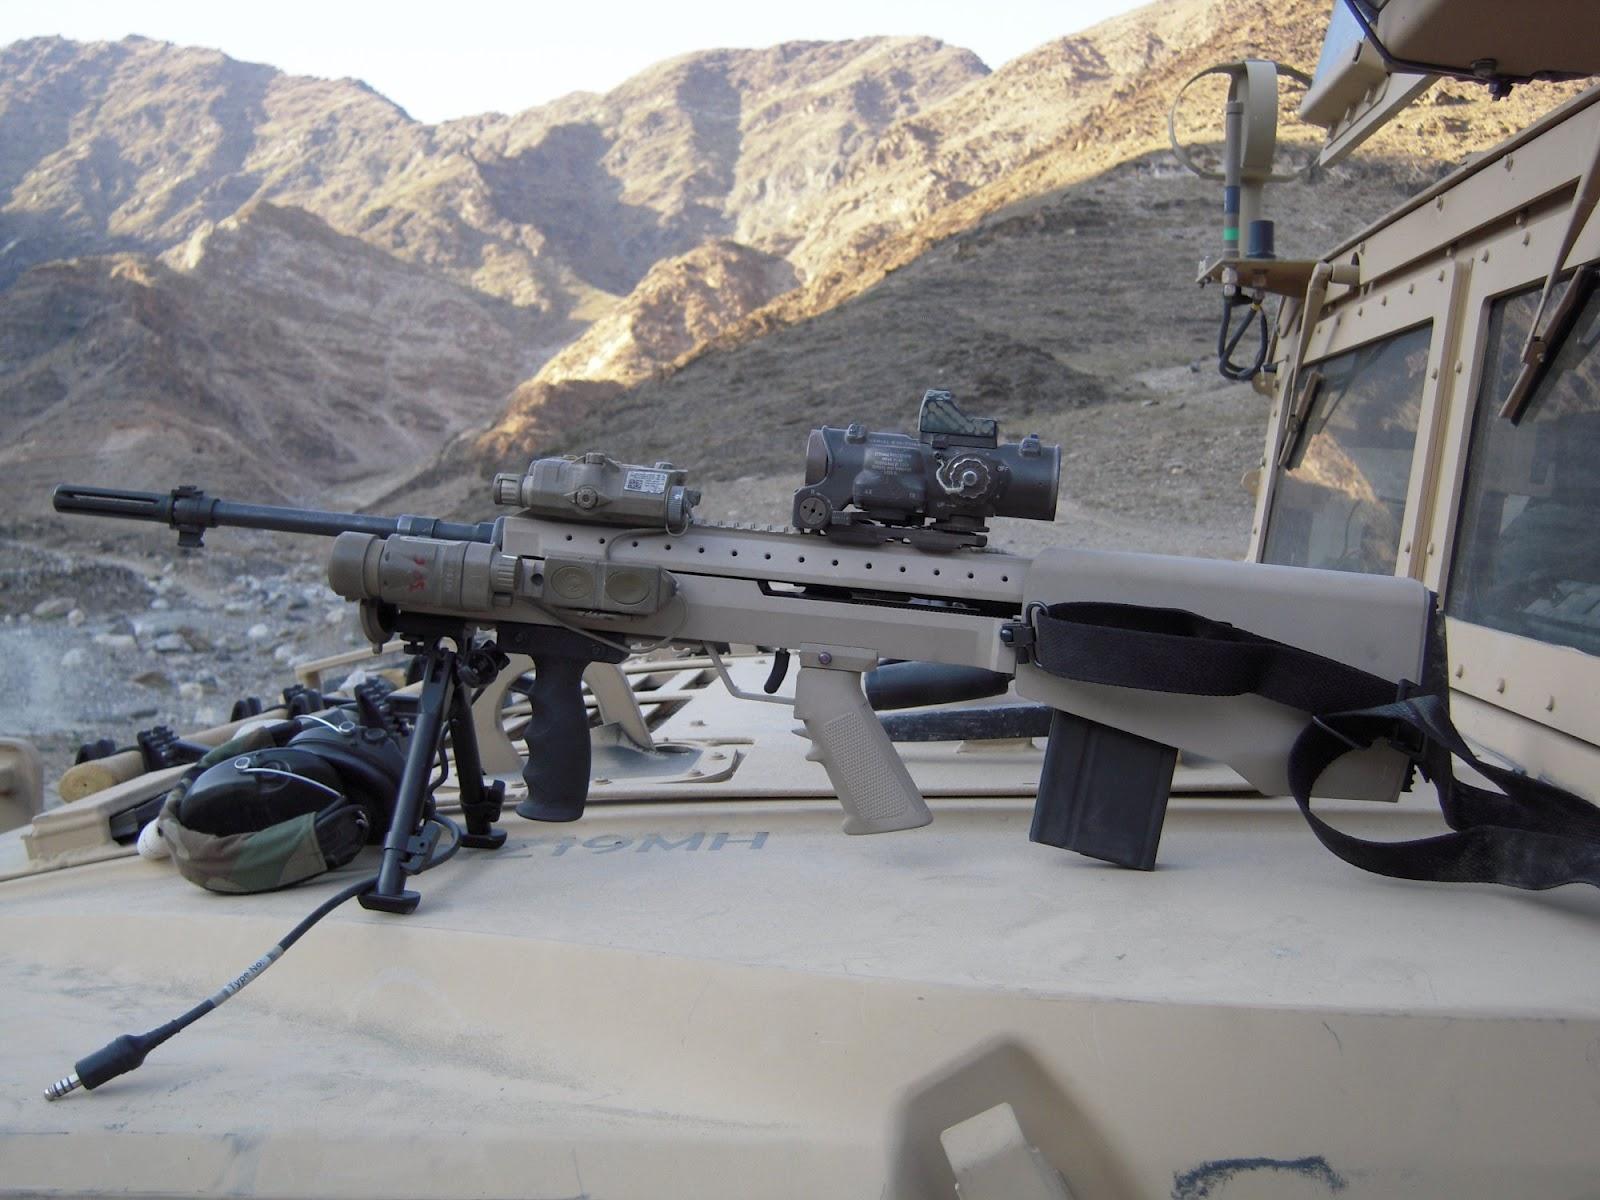 Weapons: SRSS BullDog762 Bullpup M14 M1A 7.62mm Battle Rifle Goes to ... M14 Bullpup